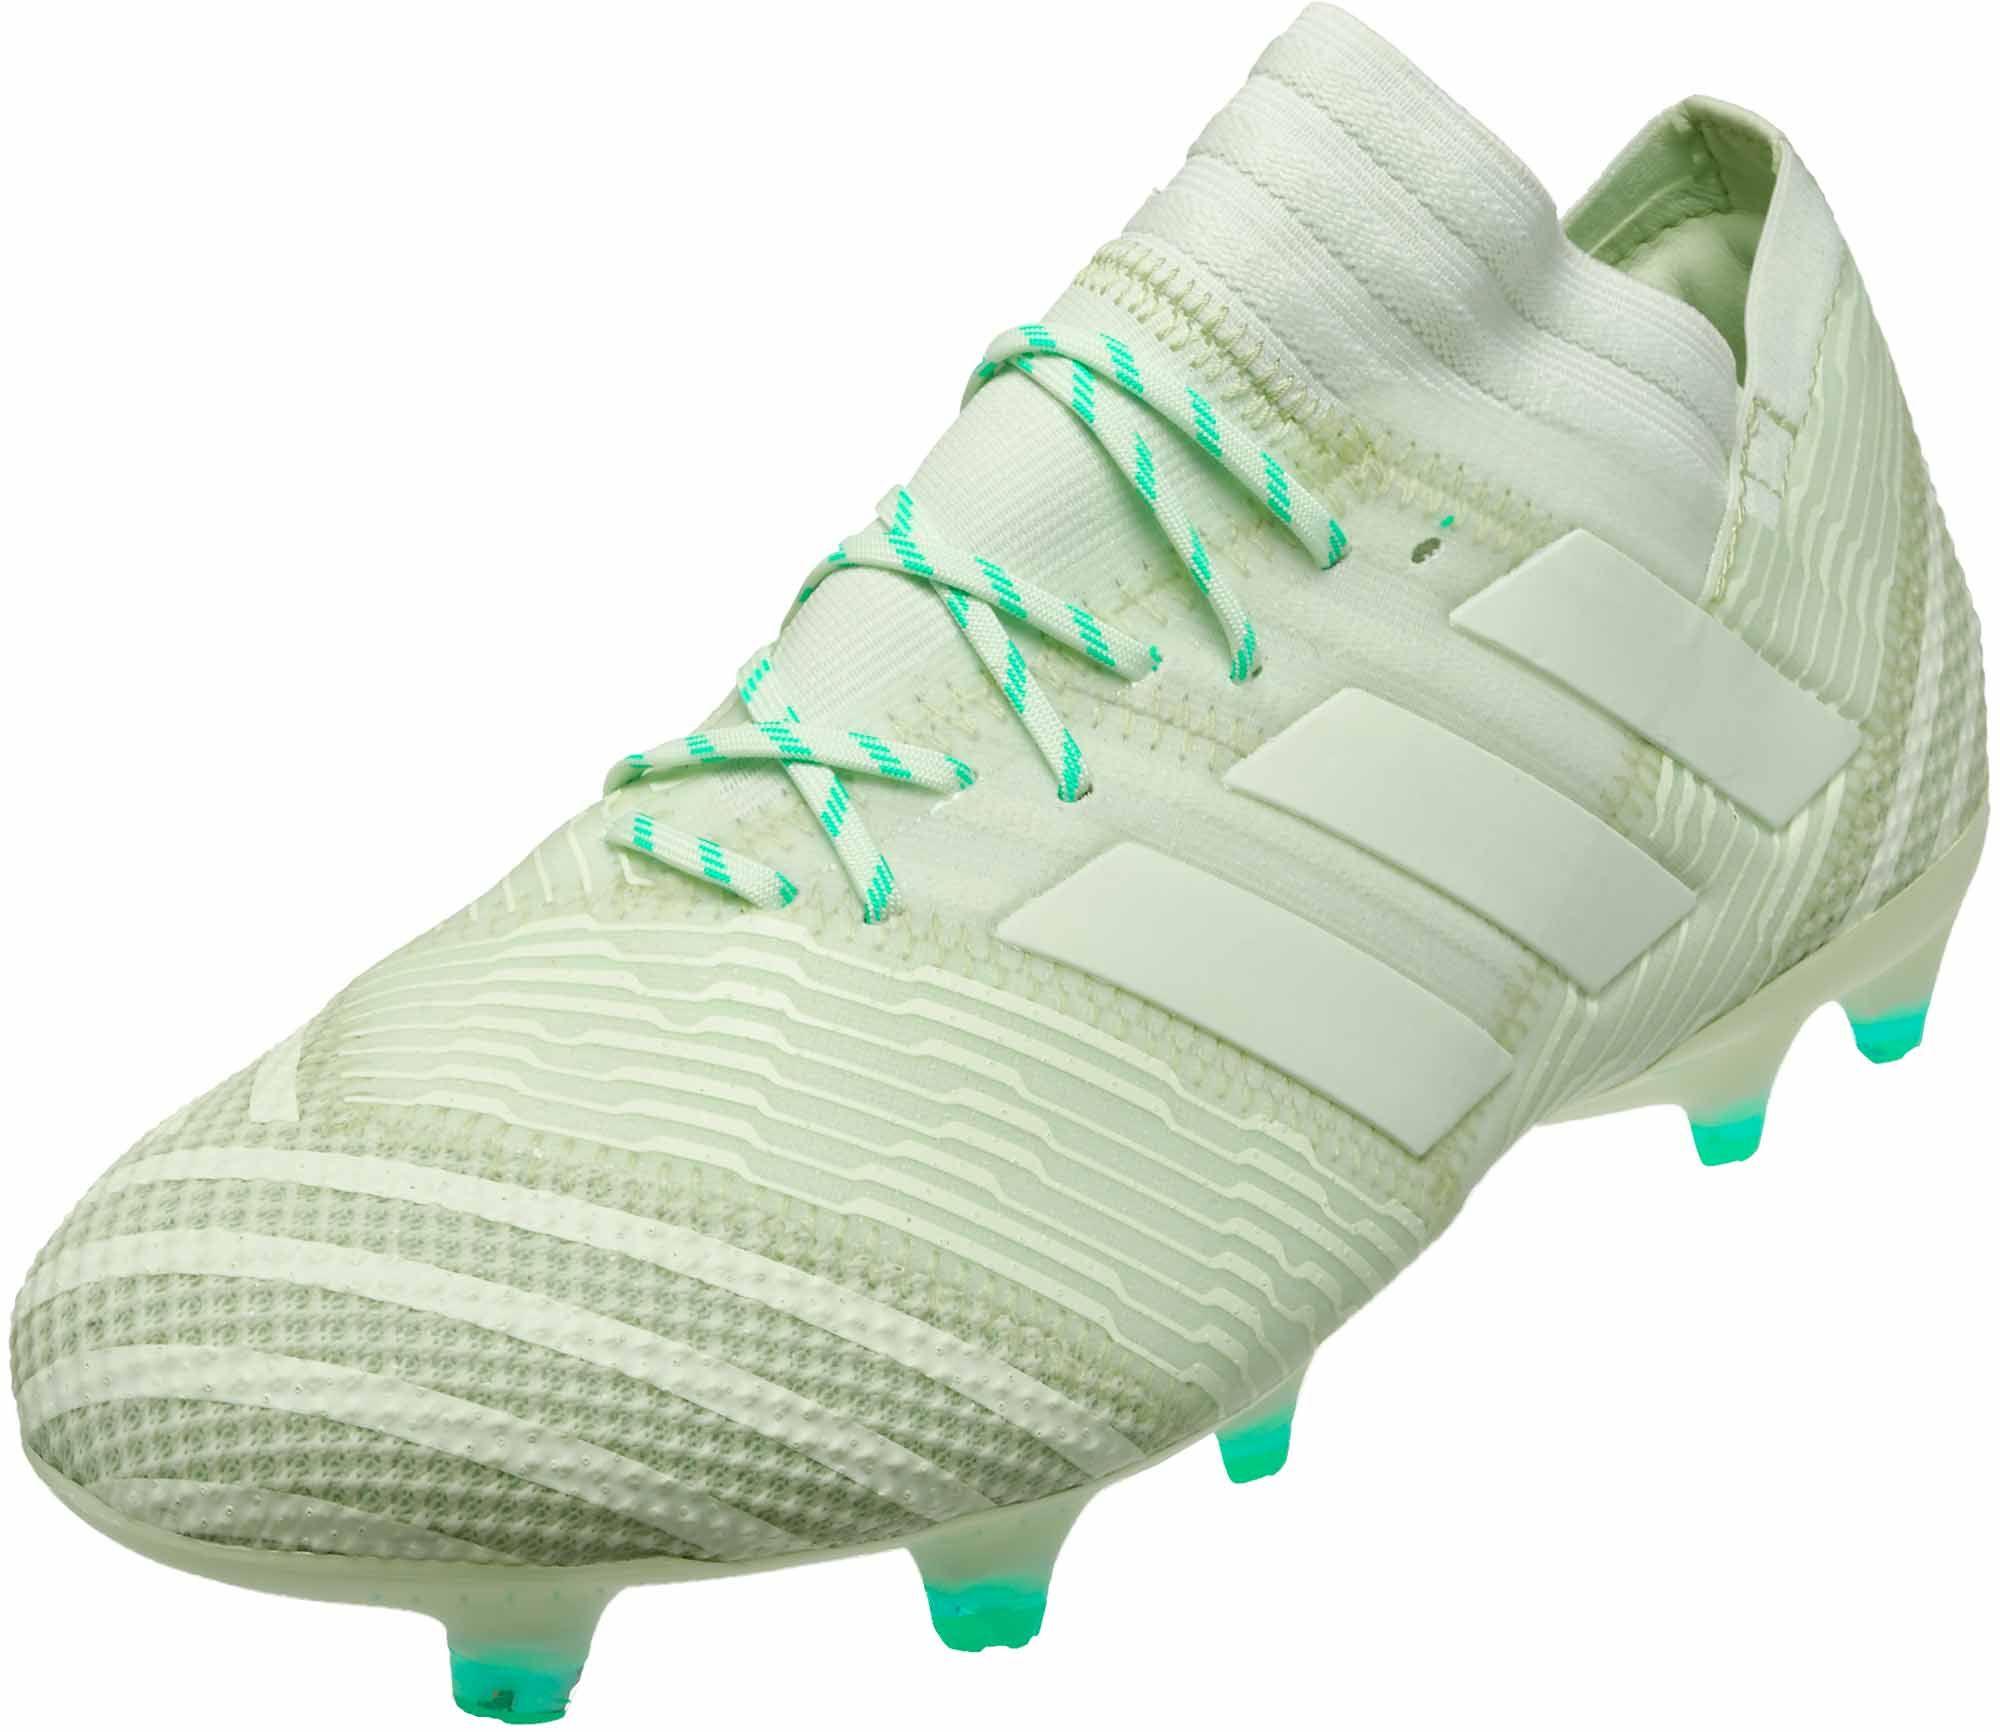 91630d5333c3 Deadly Strike pack adidas Nemeziz 17.1 Buy yours now from www.soccerpro.com